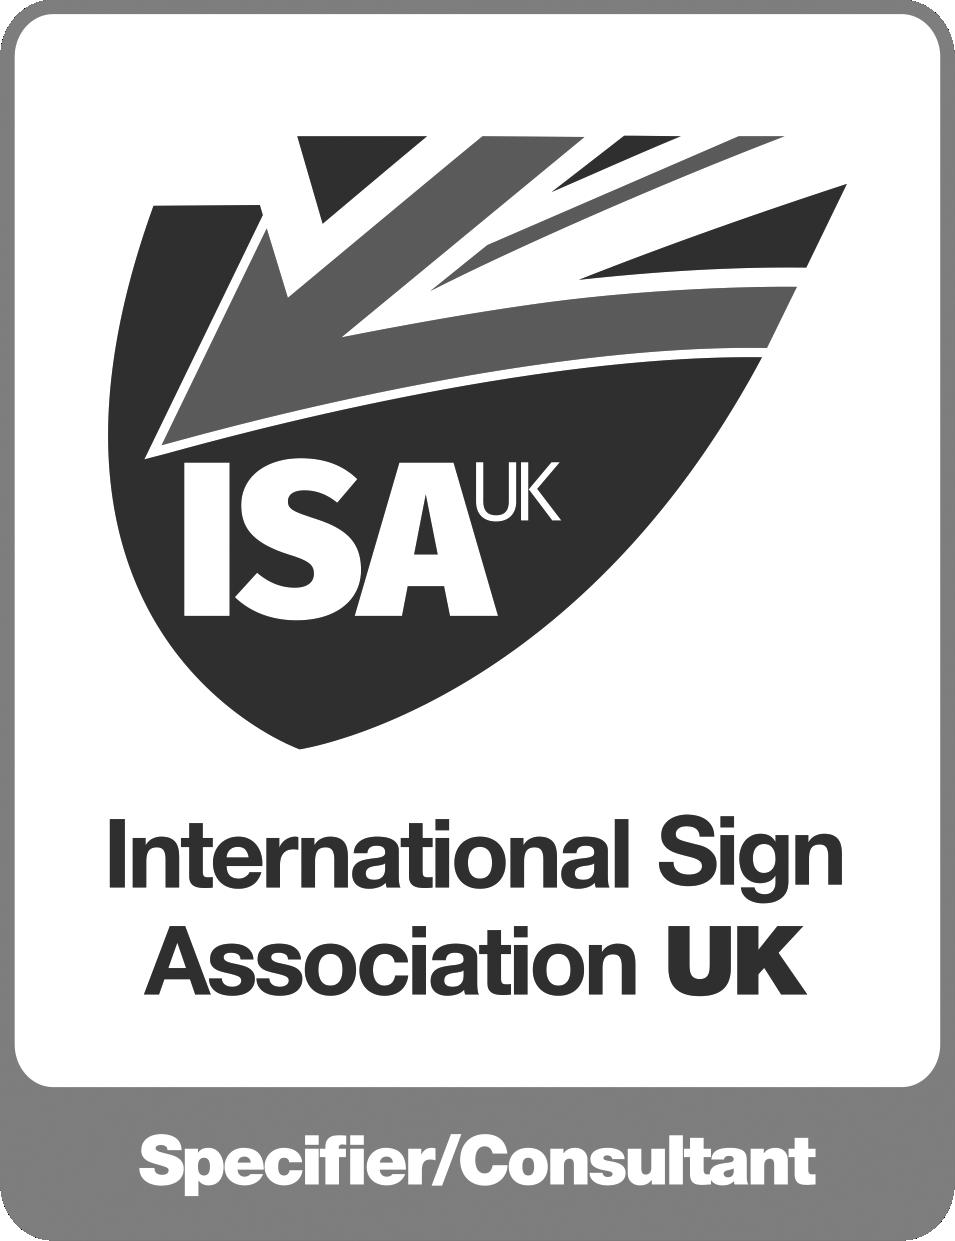 International Sign Association UK